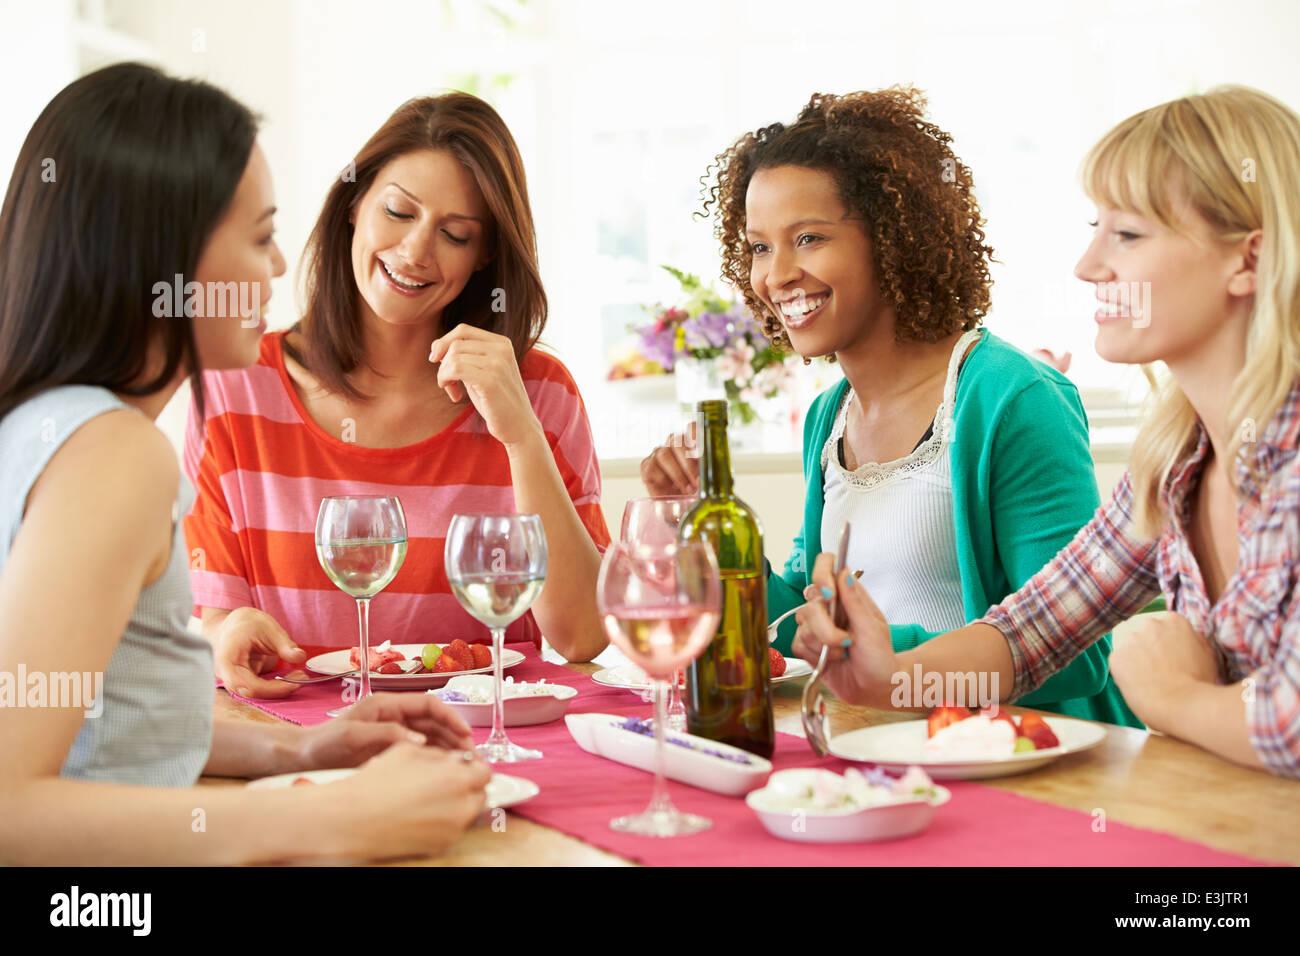 Group Of Women Sitting Around Table Eating Dessert - Stock Image